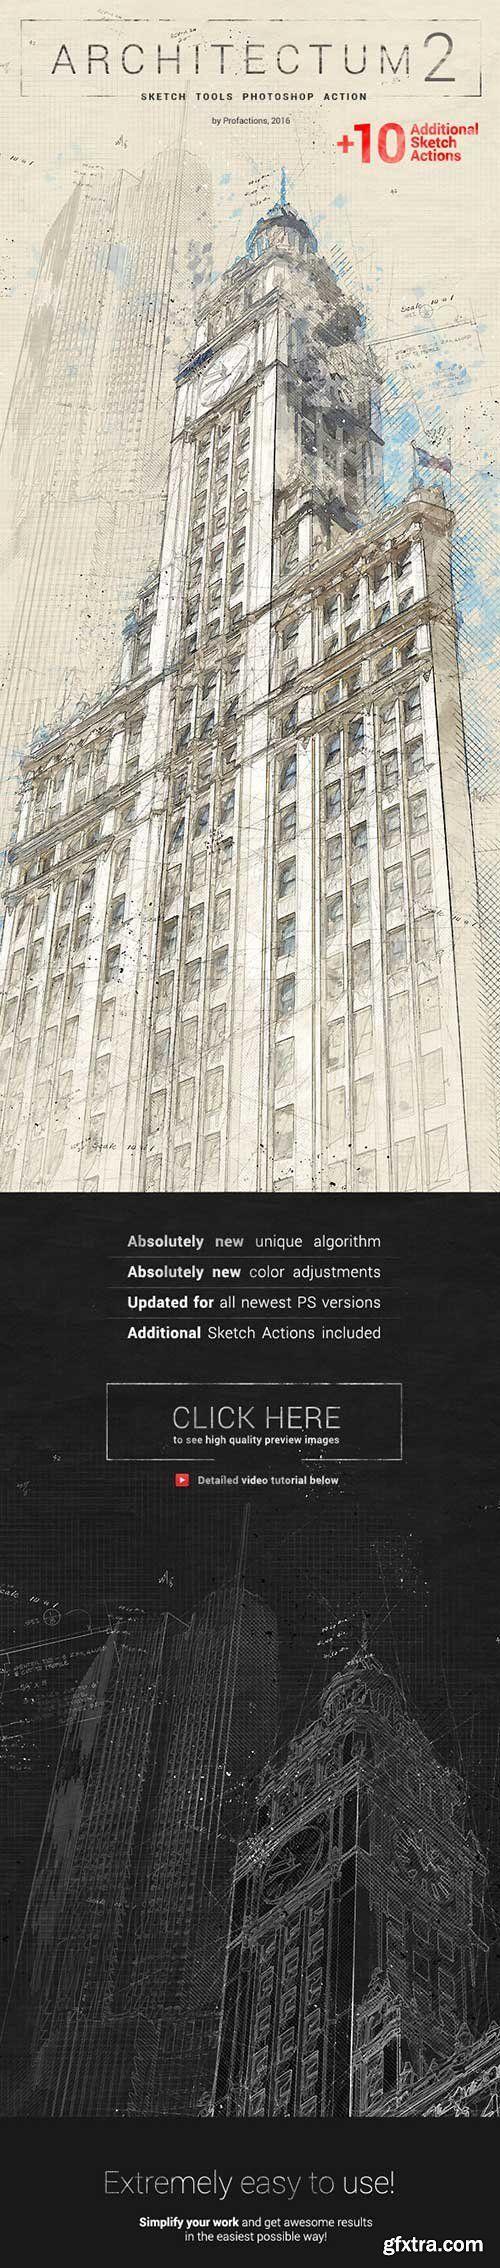 Graphicriver - Architectum 2 - Sketch Tools Photoshop Action 18436174